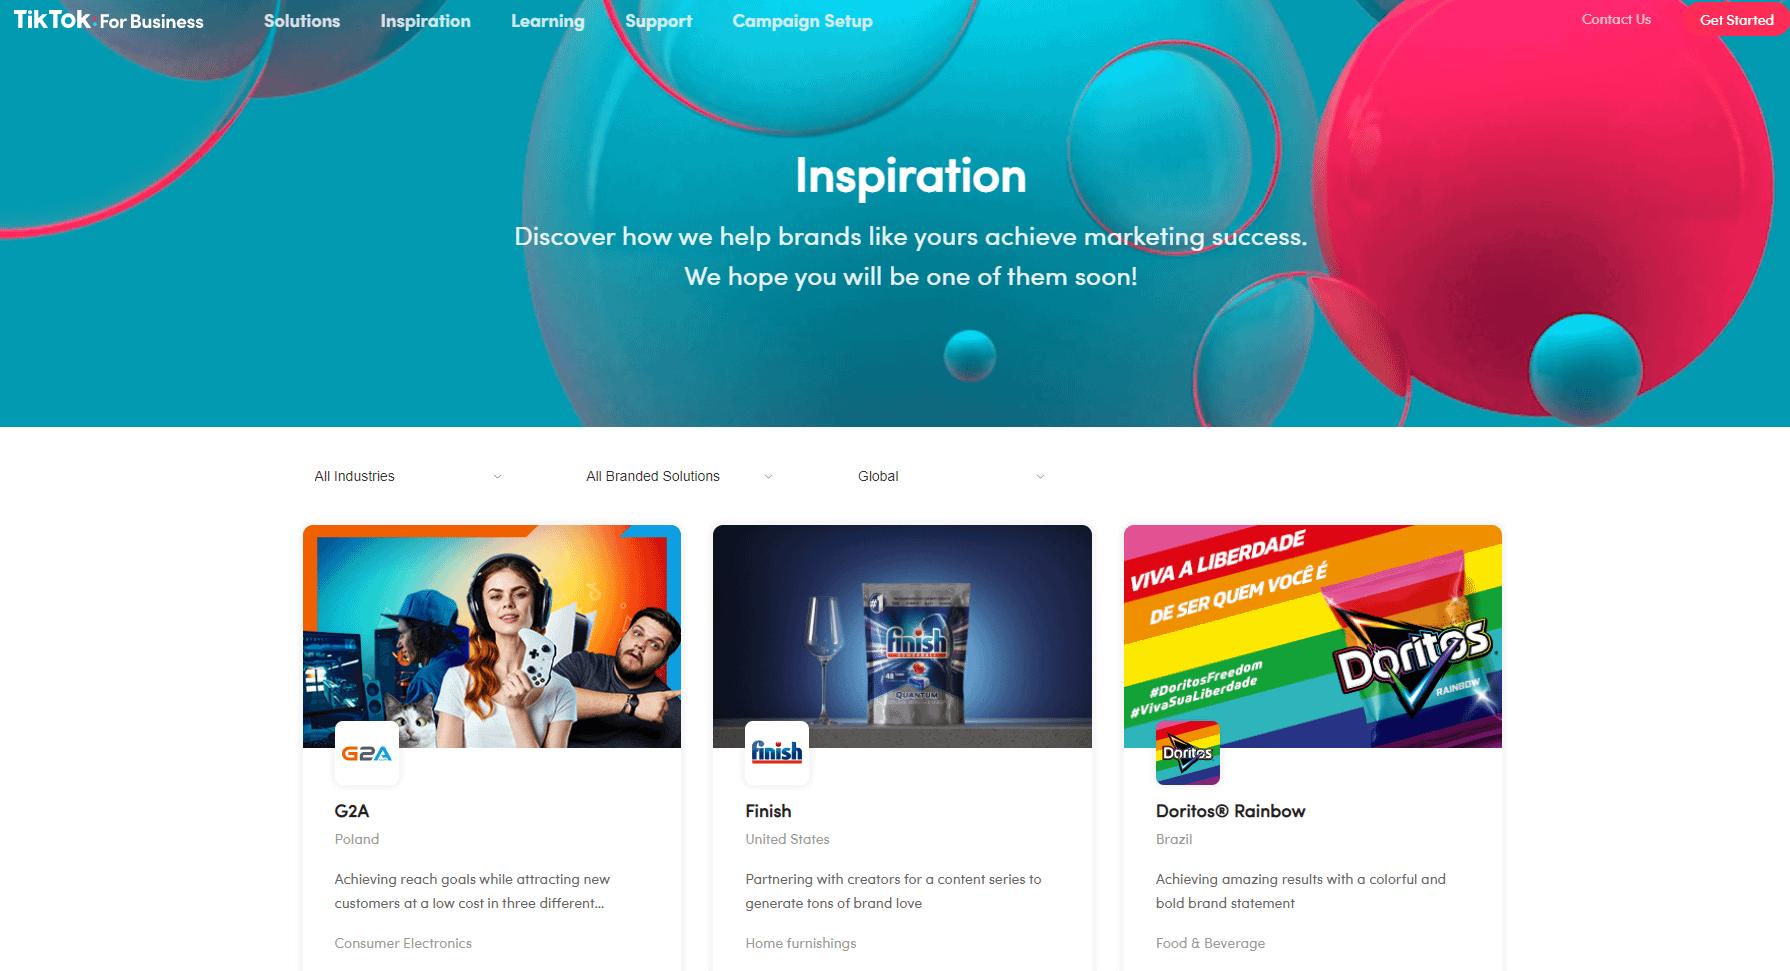 Advertise On TikTok Campaign Inspiration Case Studies Screenshot